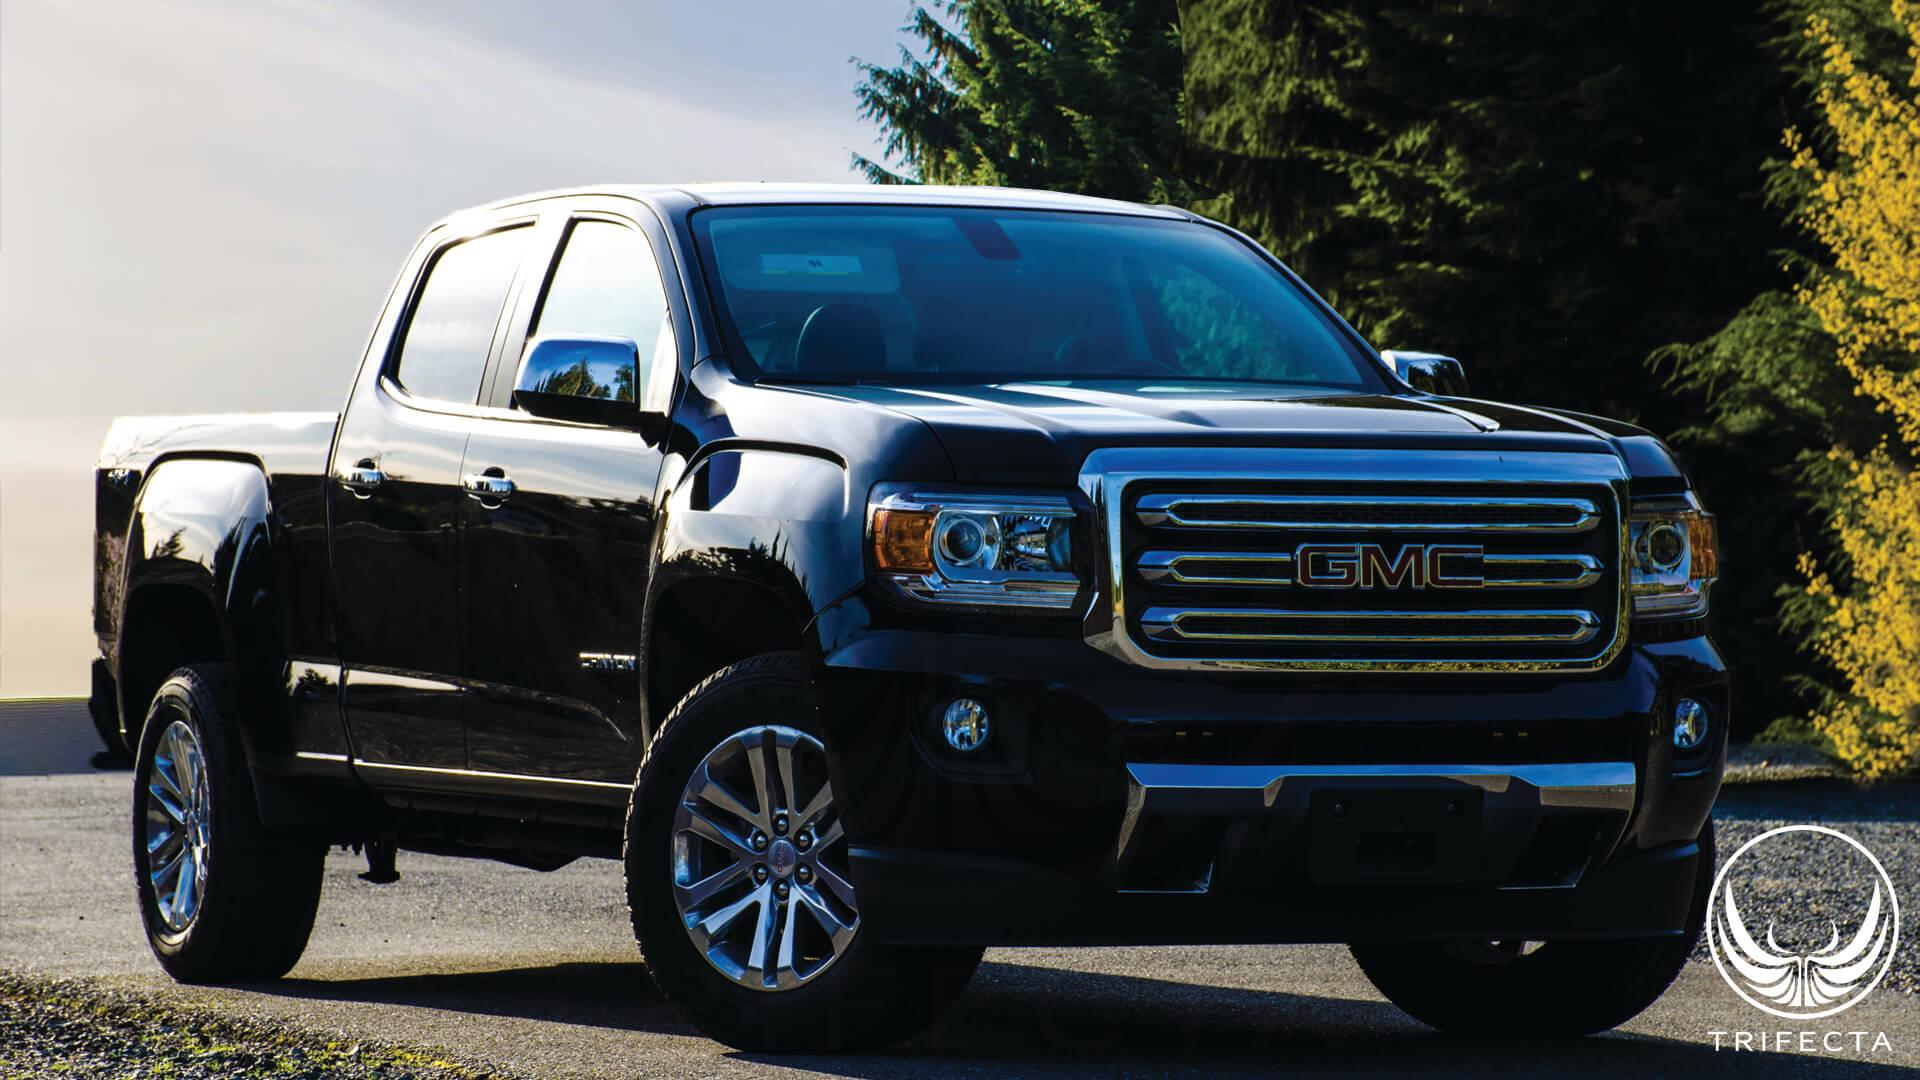 Product Review: 2015--2016 GMC Canyon - 3.6L - Advantage+